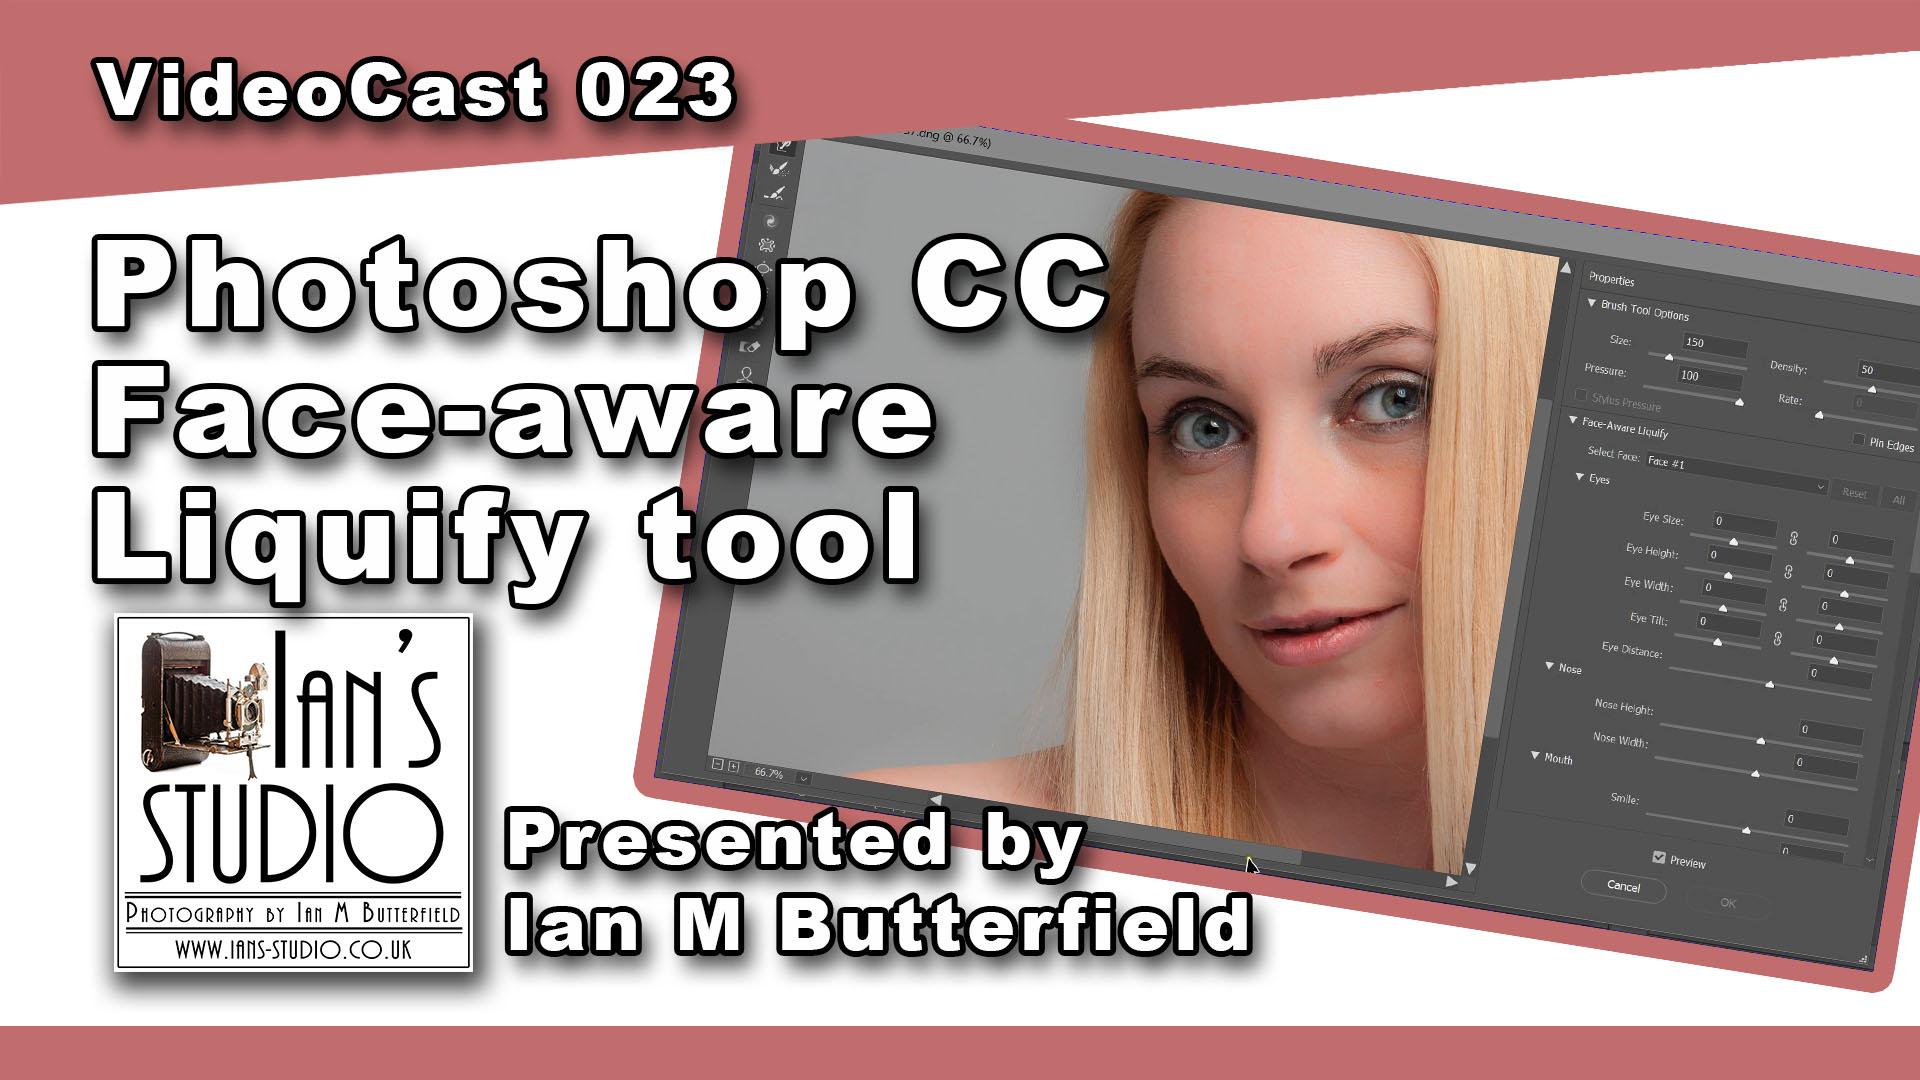 VIDEOCAST 028 Photoshop Face Aware Liquify